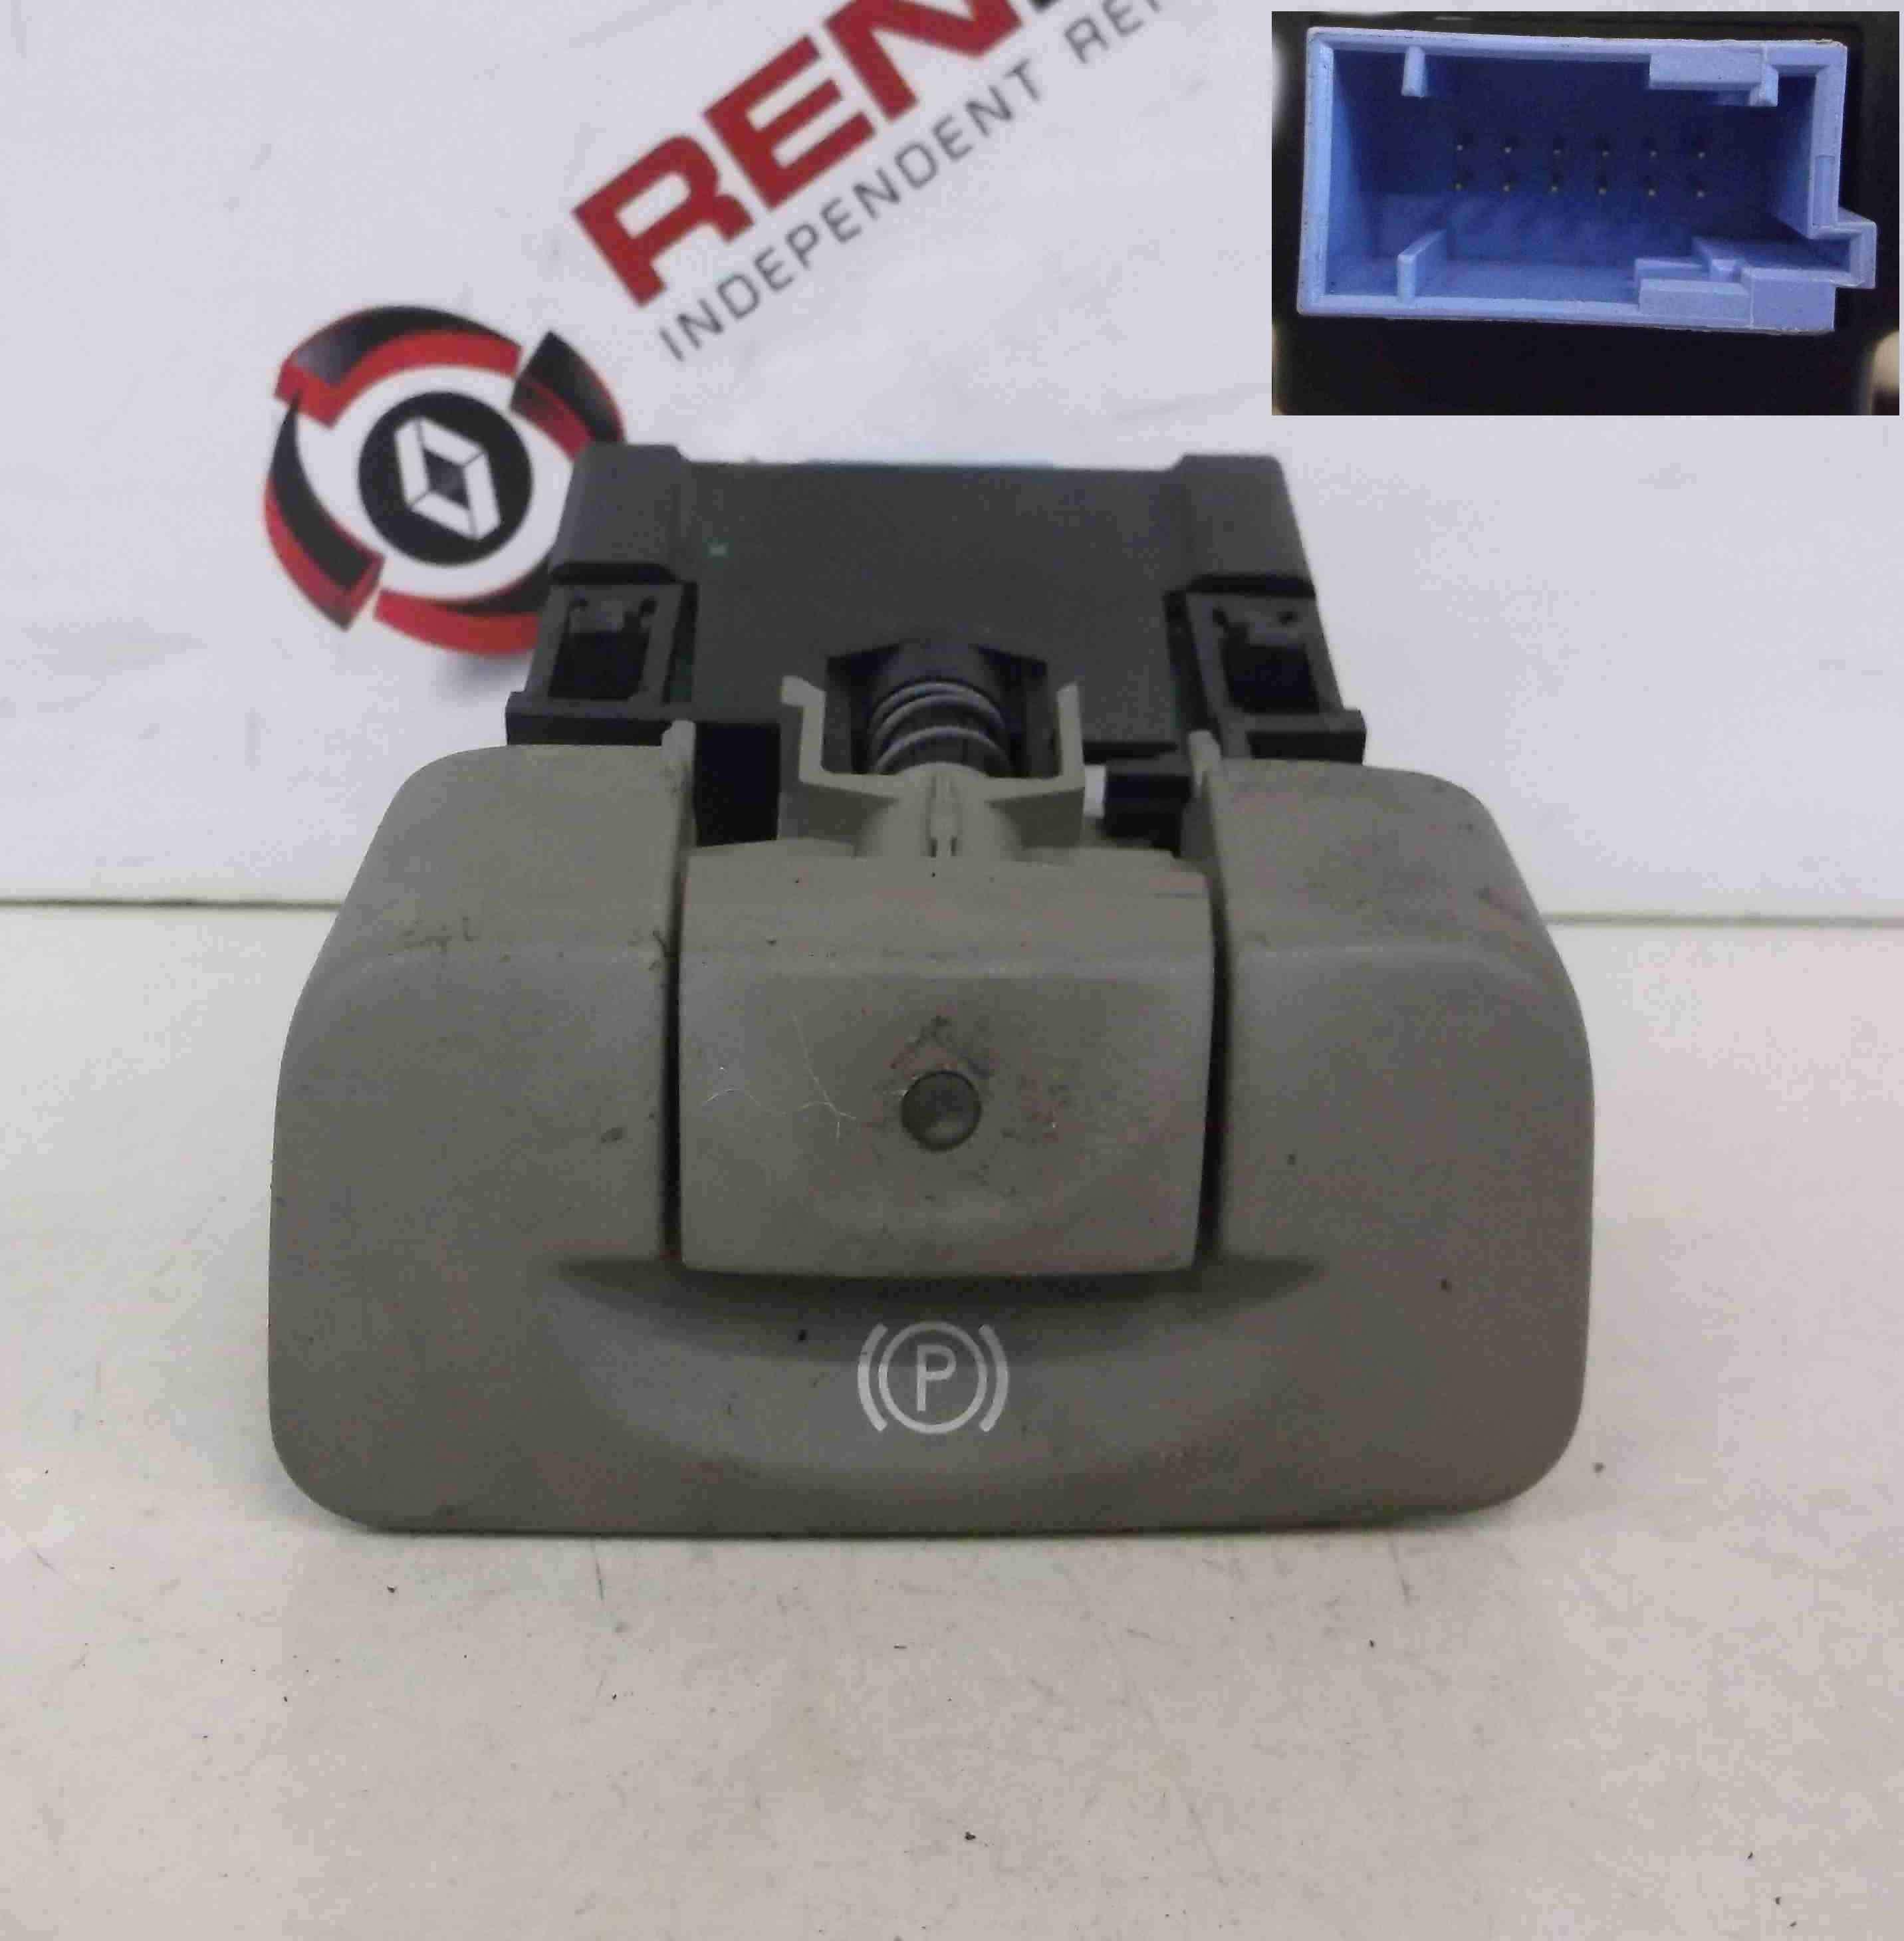 Renault Megane Scenic 2003-2009 Electric Handbrake Lever Button Switch